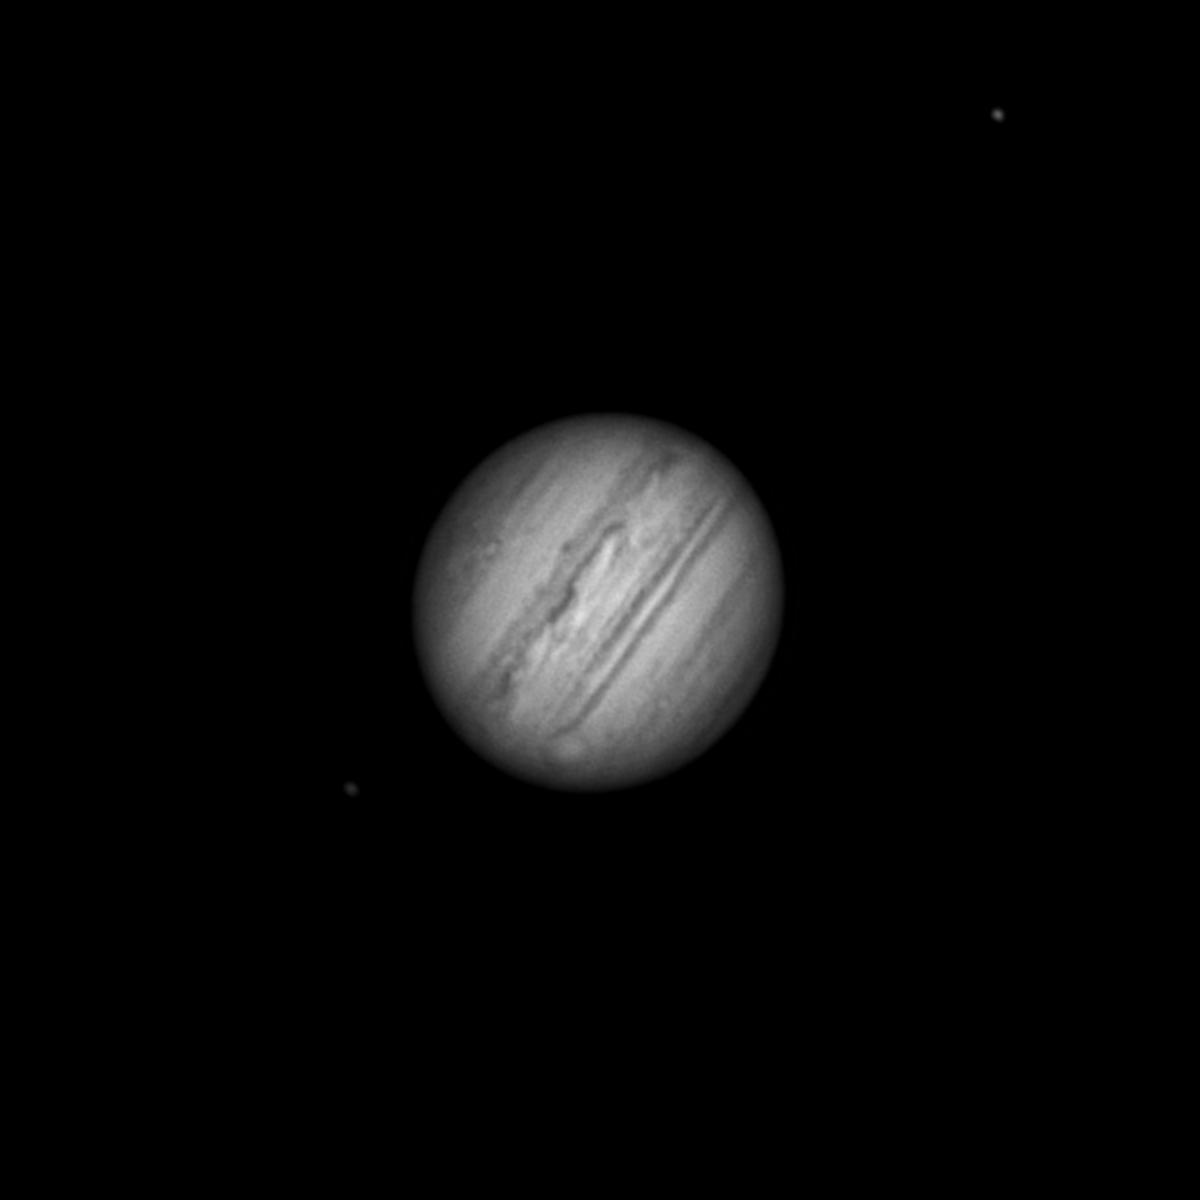 423215414_Jowisz_Io_Europa.png.cf86bfe2b6a238b27767bb803fd1b610.png